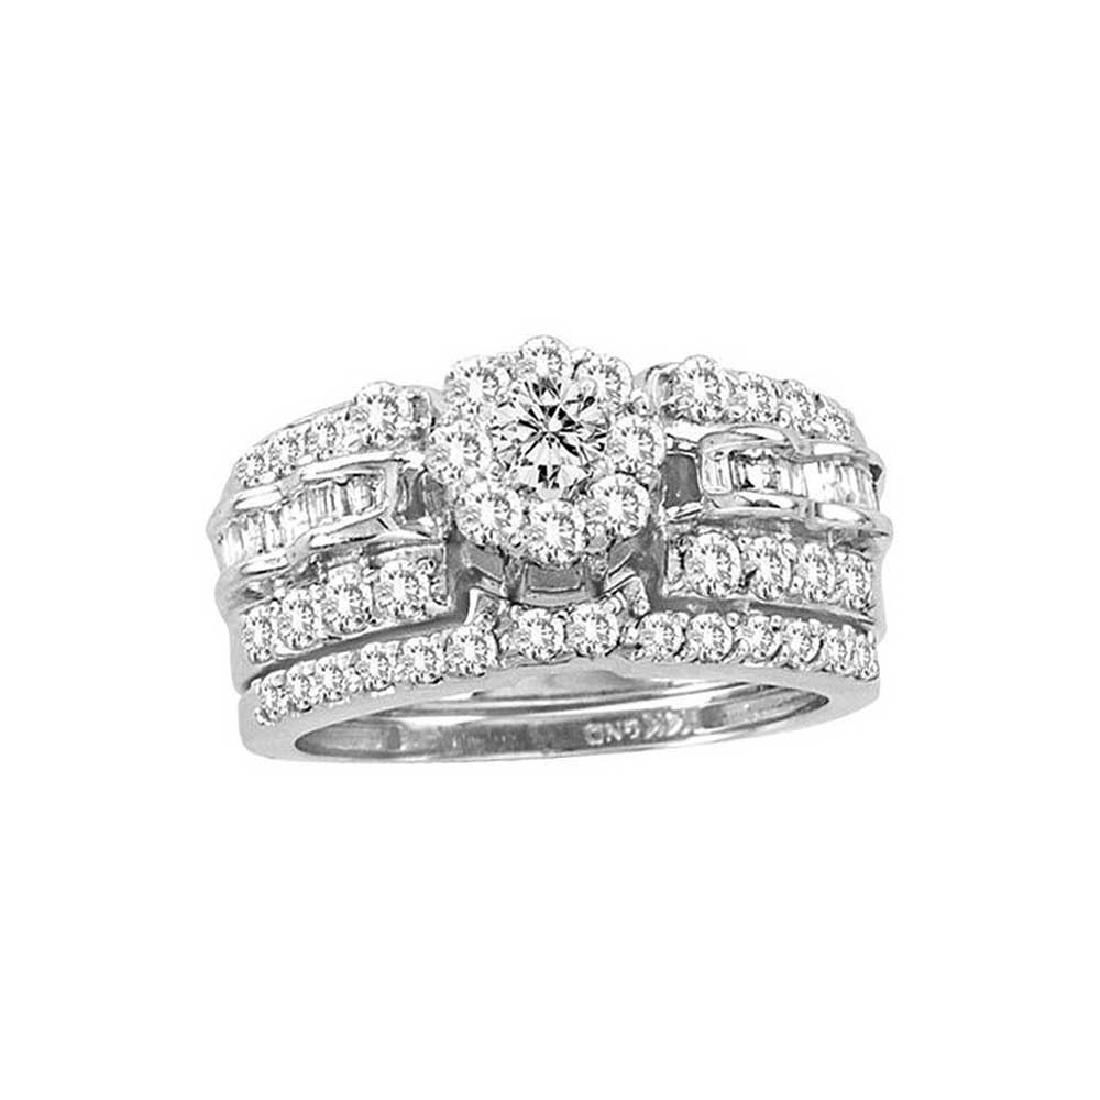 138 CTW Diamond Cluster Bridal Engagement Ring 14KT